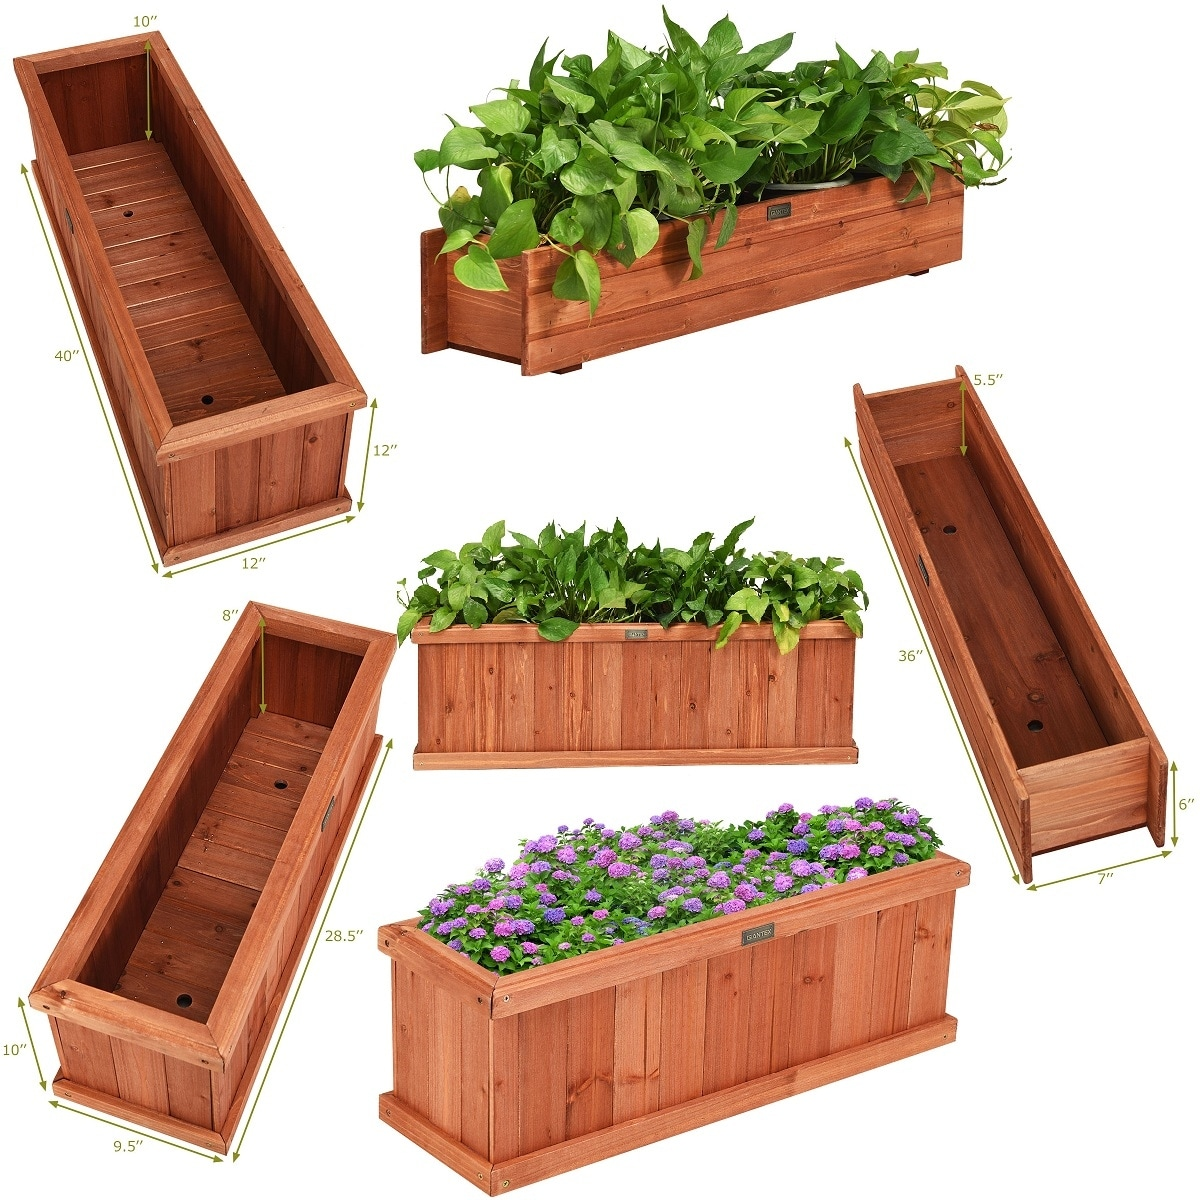 Image of: Shop Black Friday Deals On 28 36 40 Inch Wooden Flower Planter Box Garden Yard Decorative Window Overstock 28794934